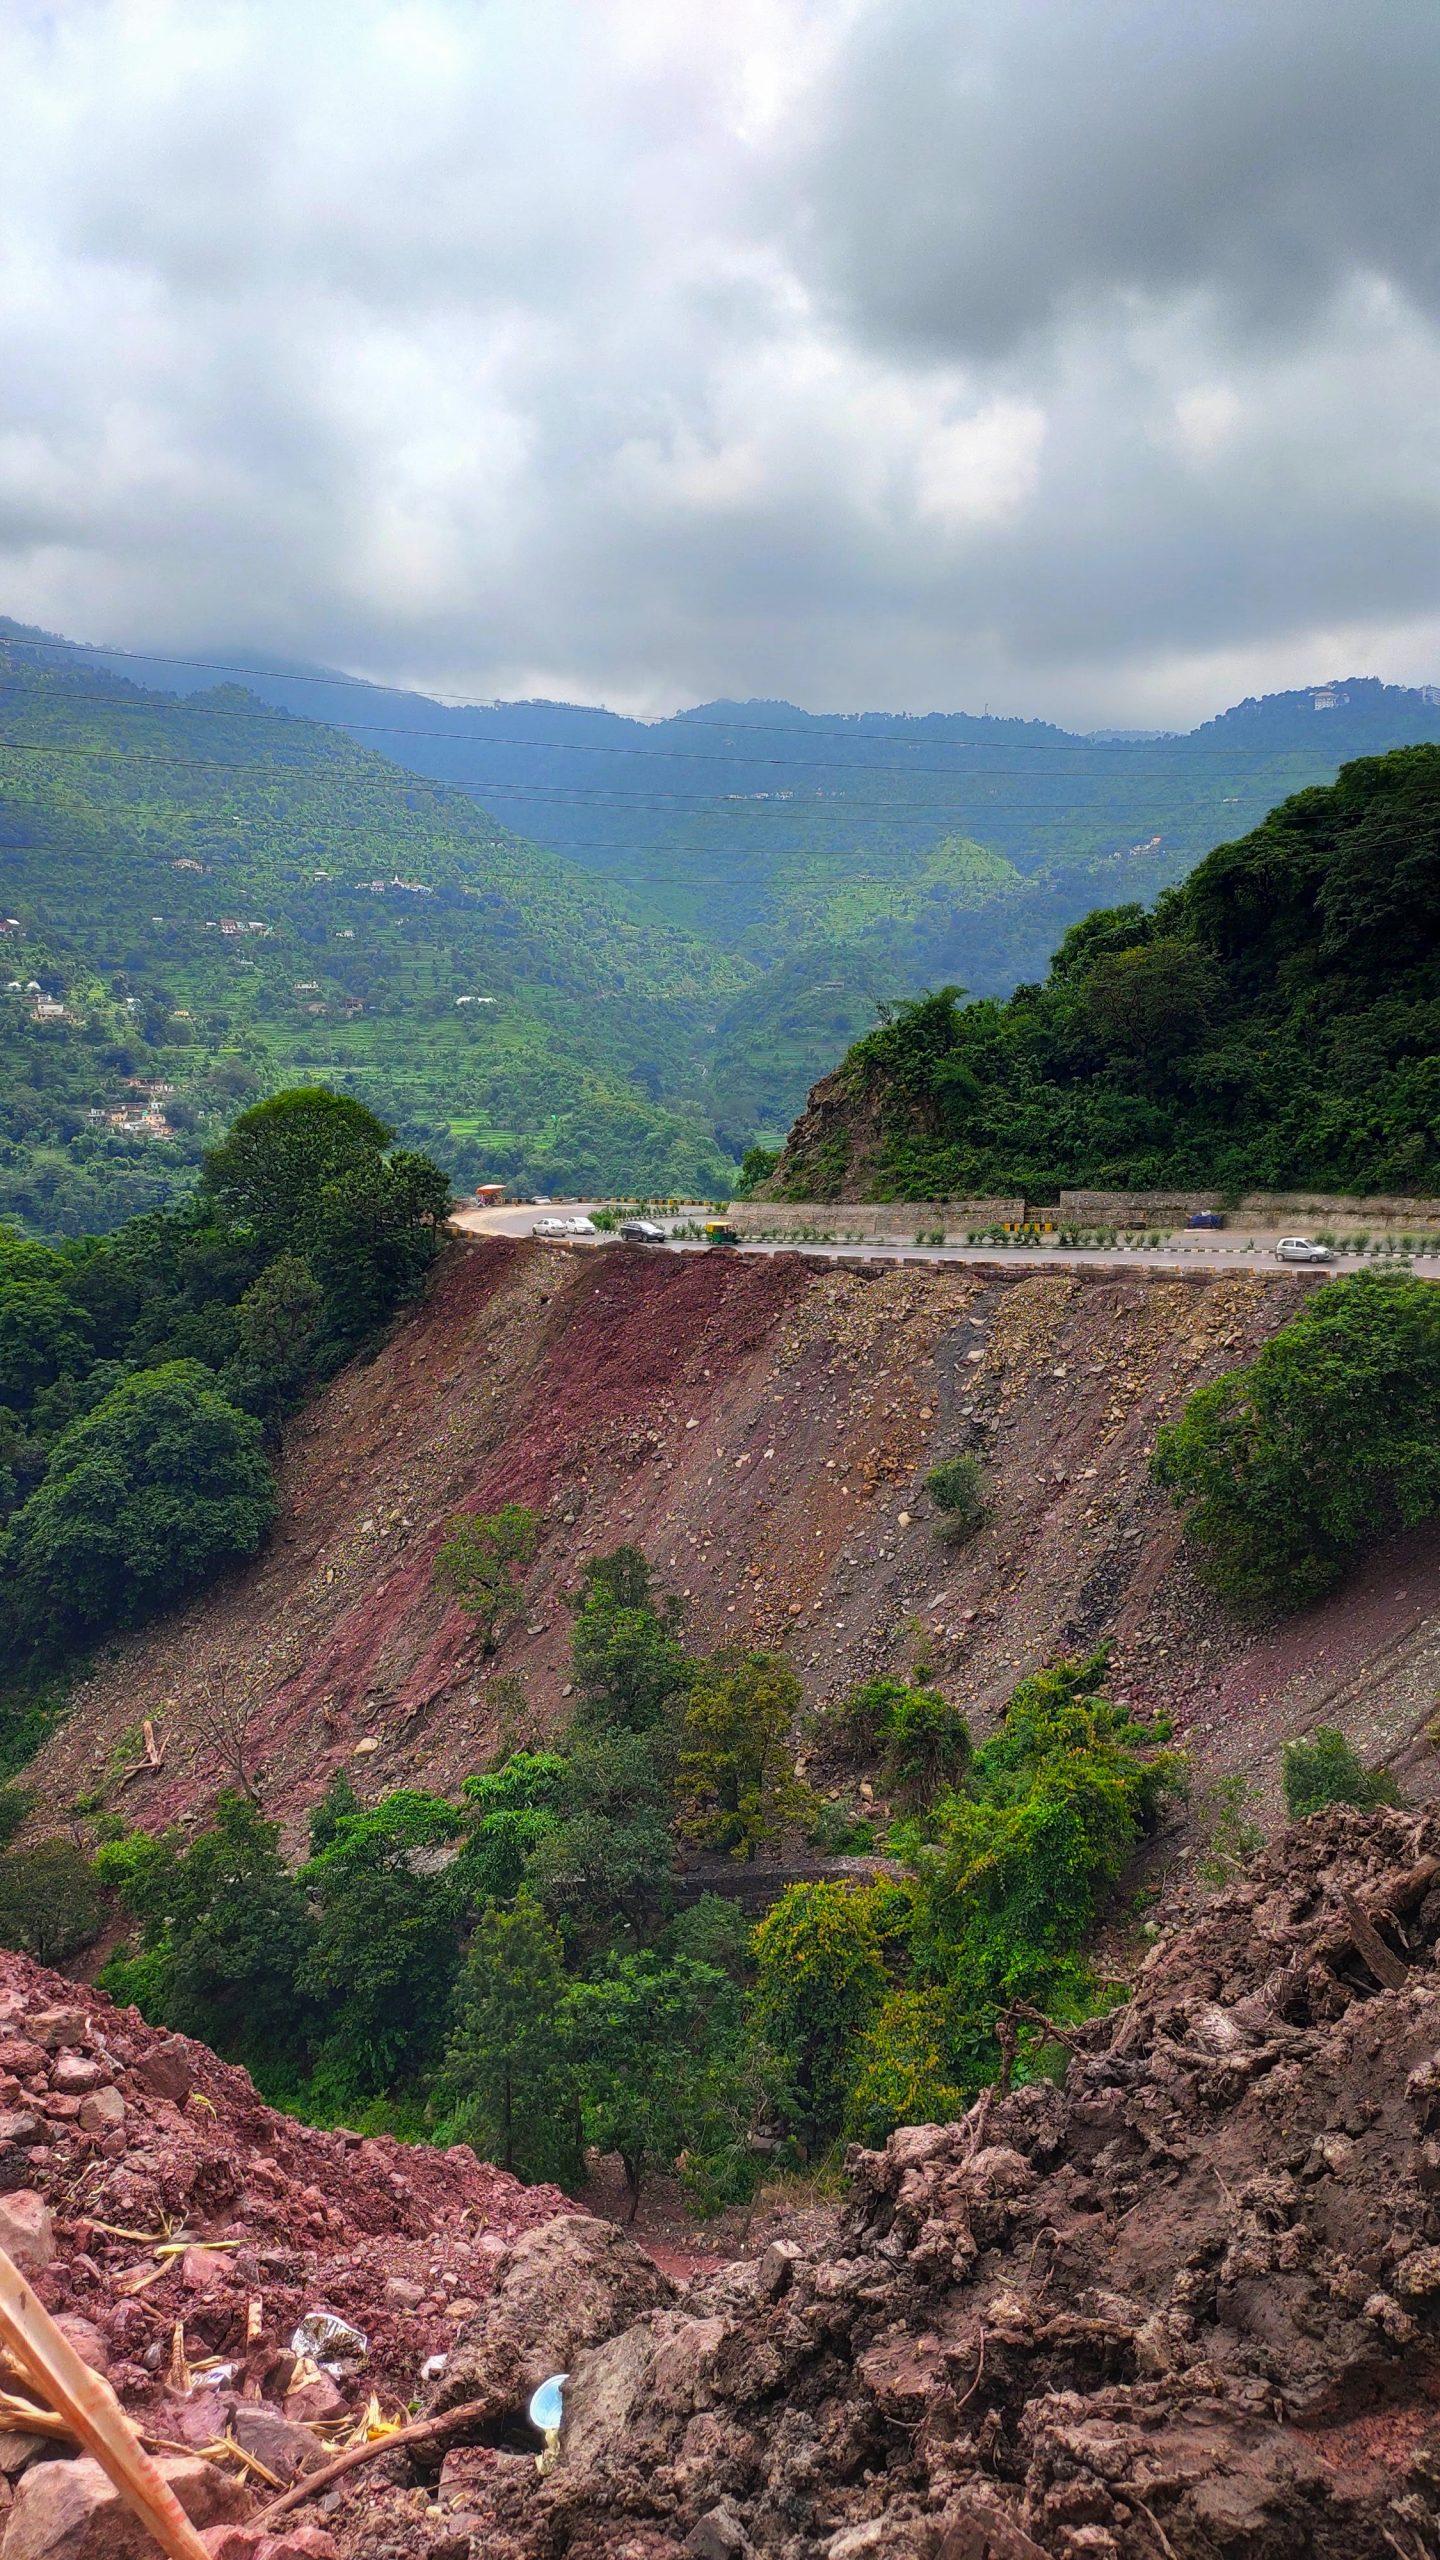 A high altitude road